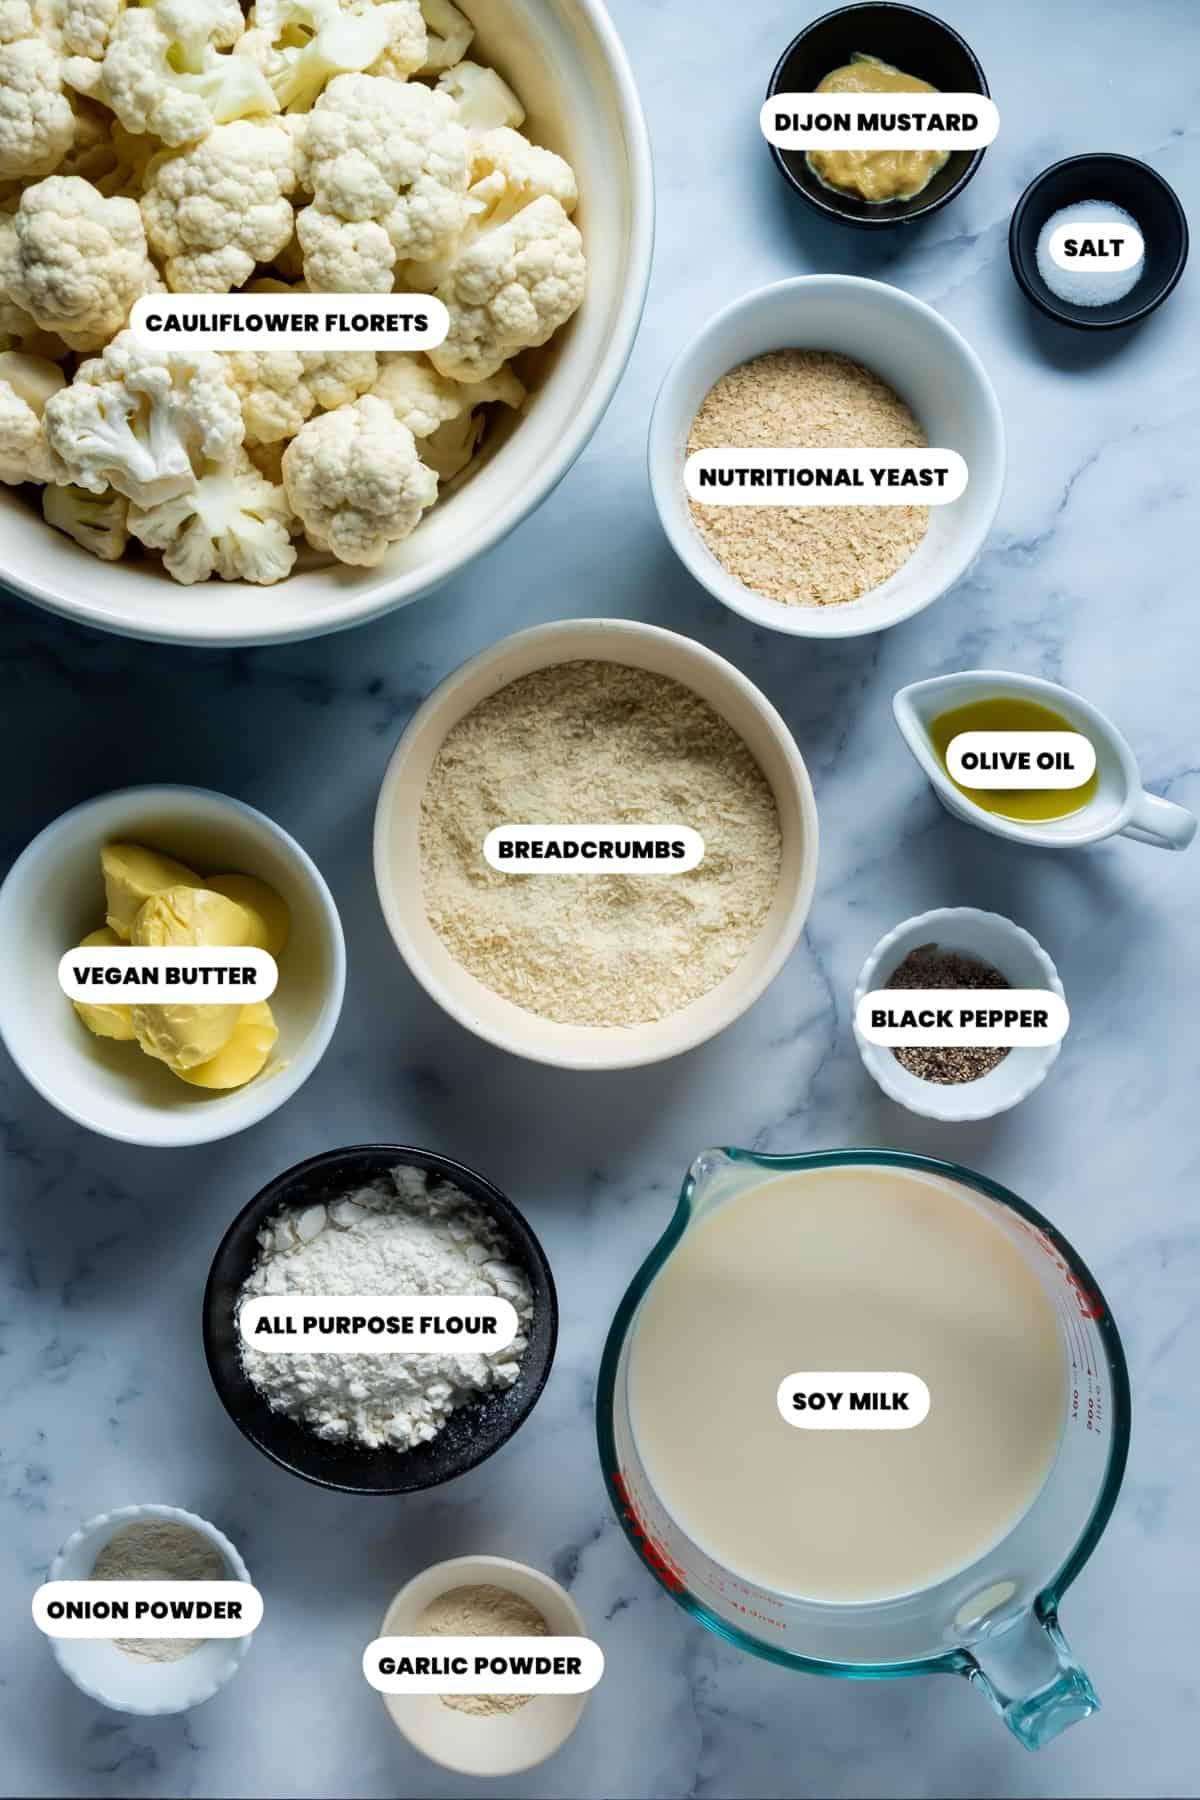 Photo of the ingredients needed to make vegan cauliflower cheese.